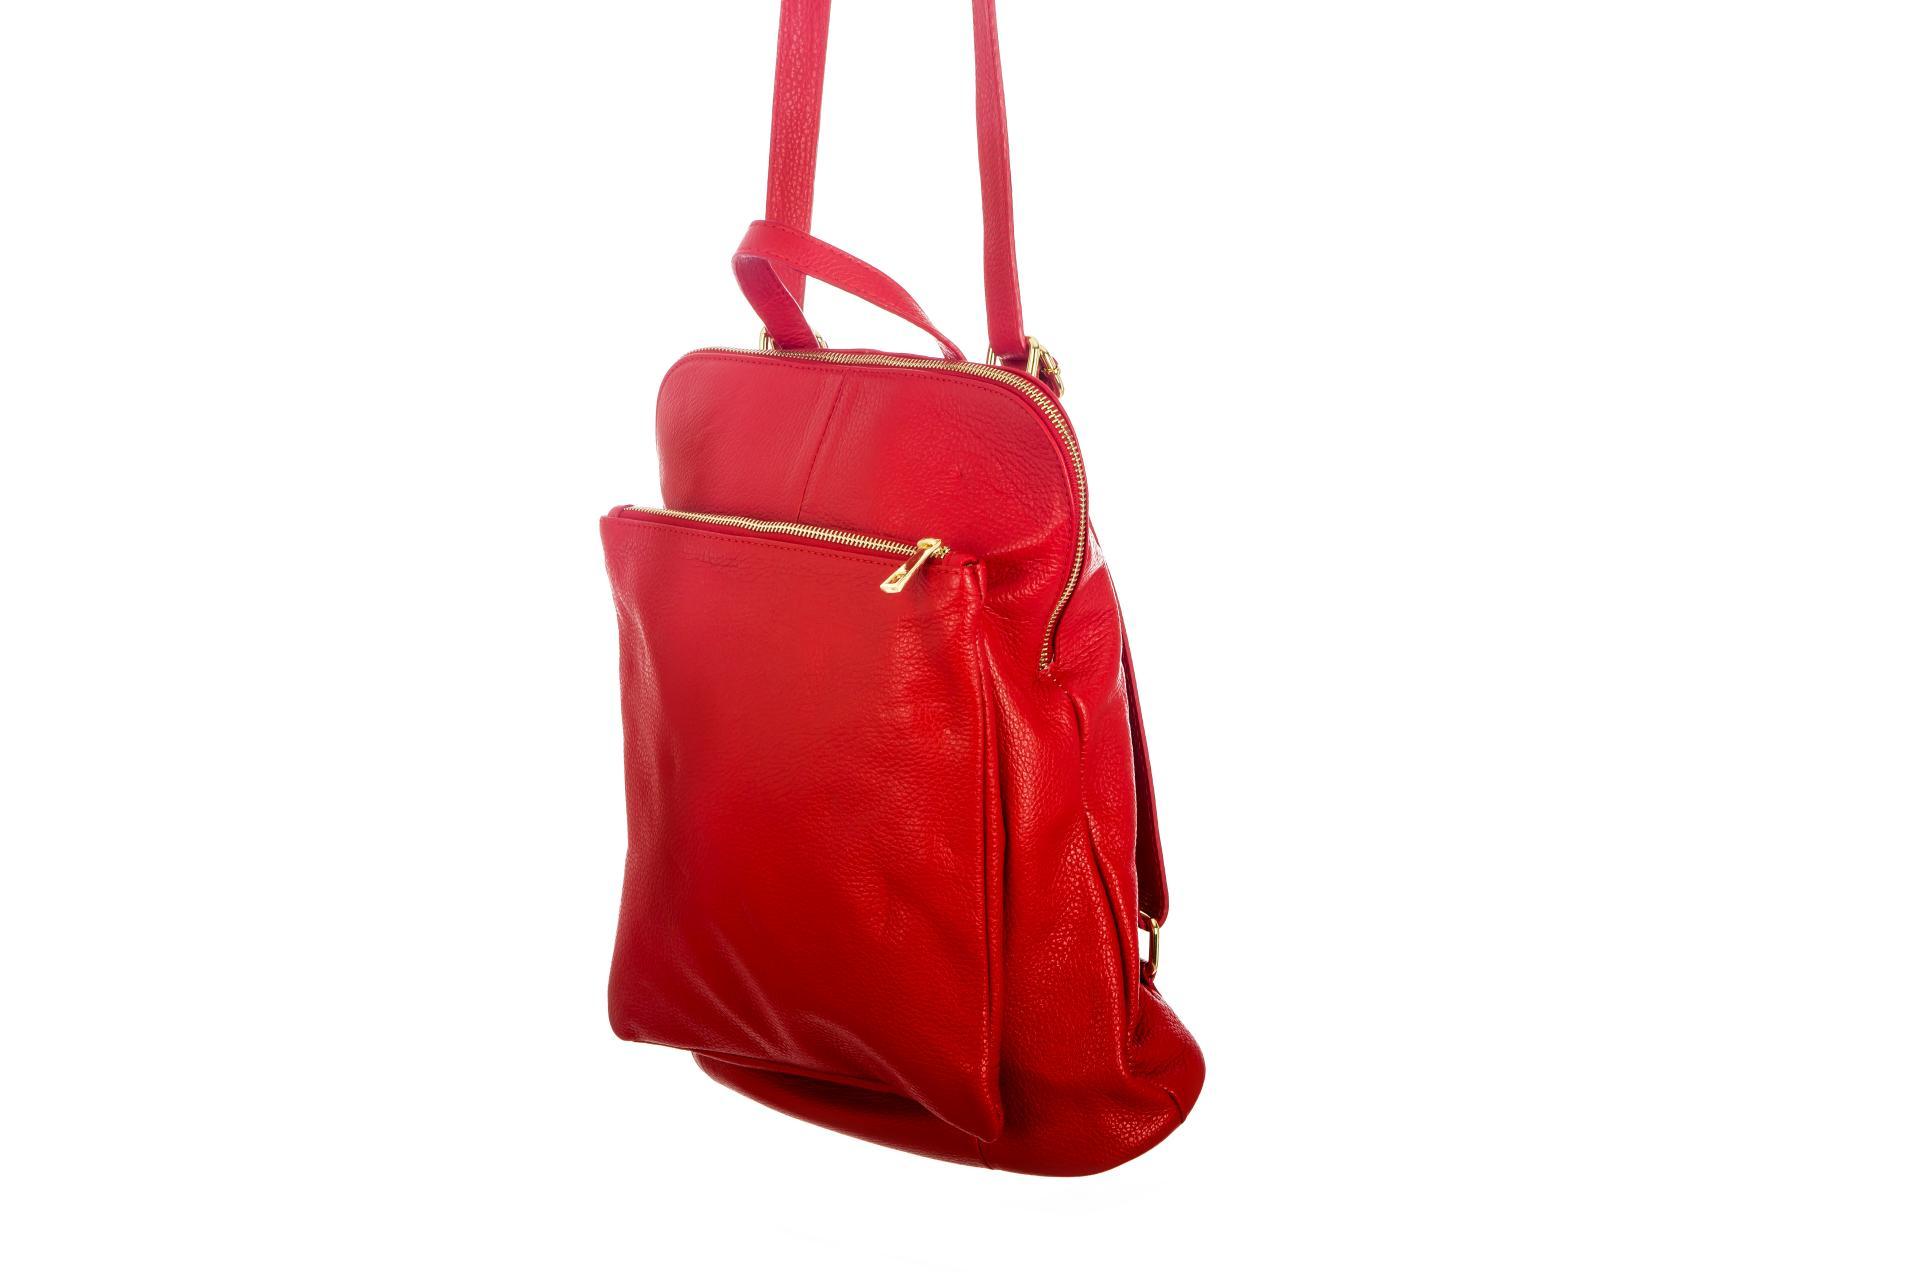 mochila urbana roja 781.jpg